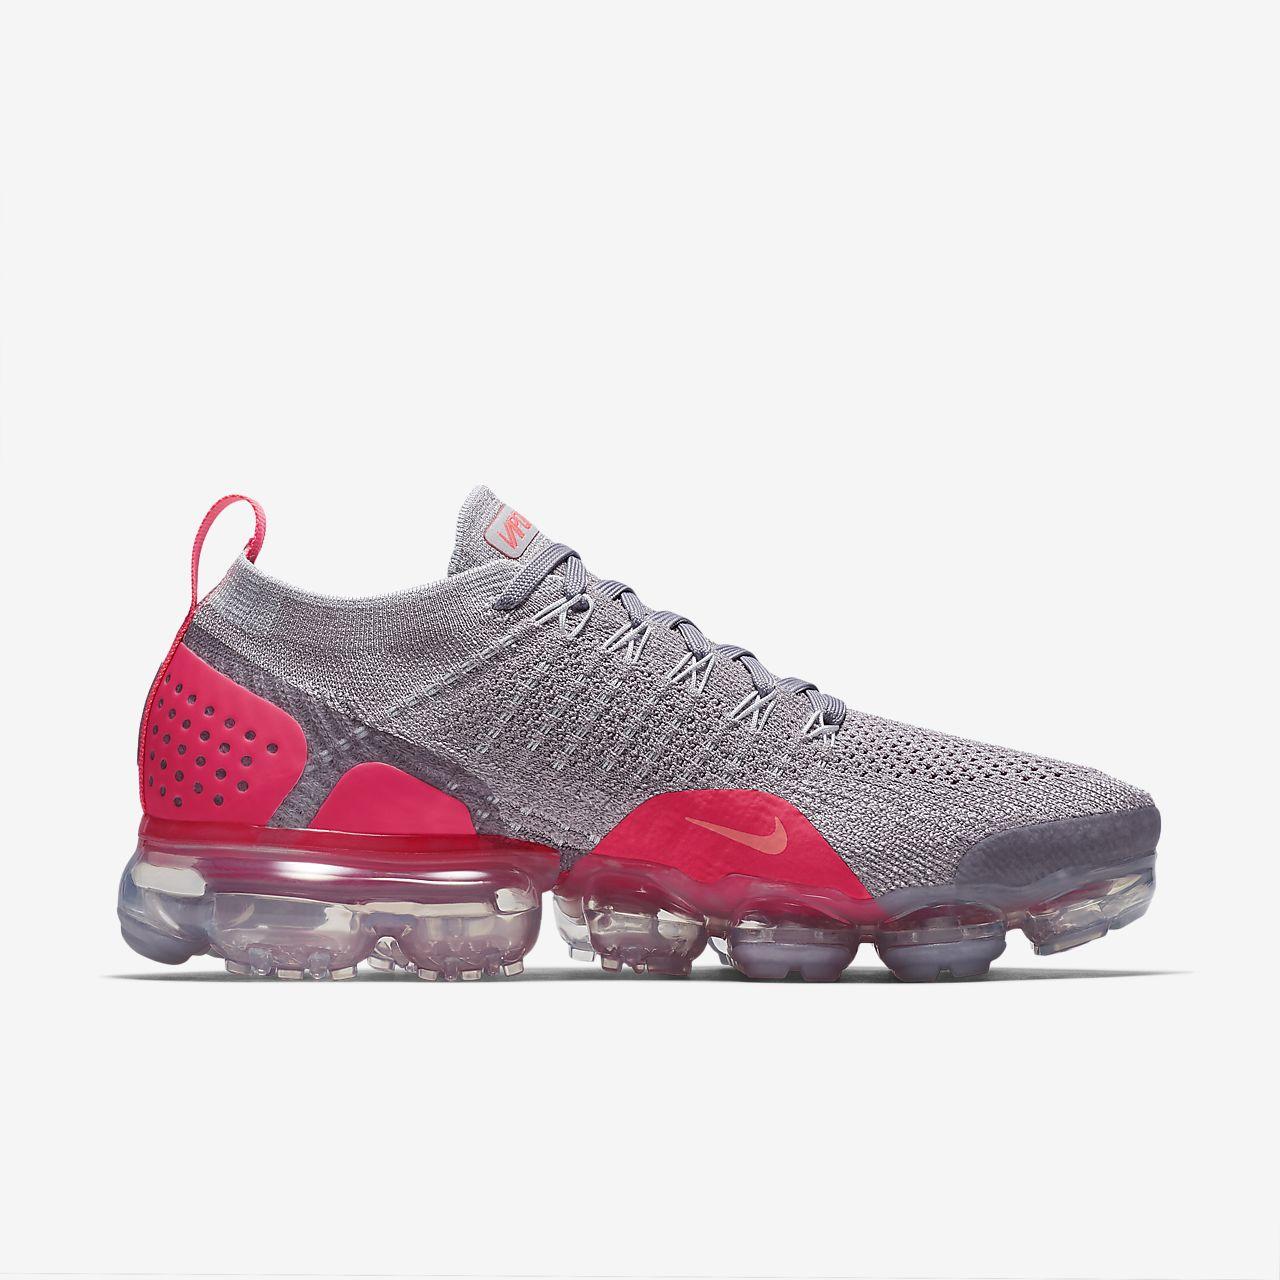 0d70902fb10ab Nike Air VaporMax Flyknit TPU Grey Orange Men s Running Shoes